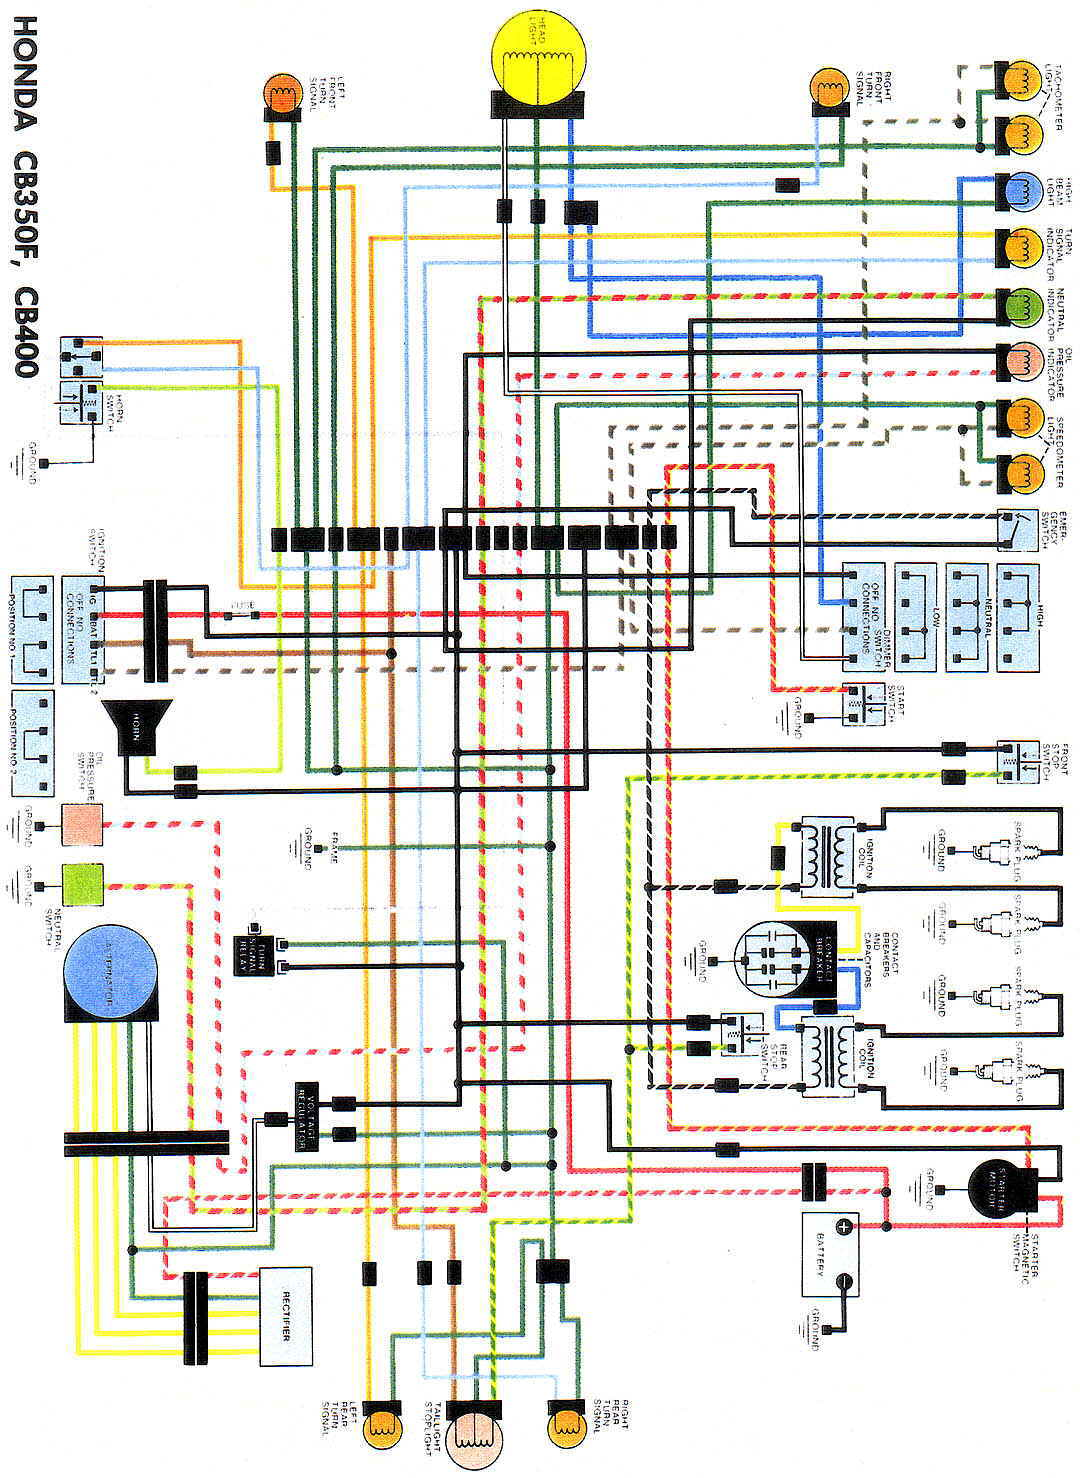 honda ascot wiring diagram the uptodate wiring diagram honda atc carb diagram 1984 honda vt500 ascot wiring diagram wiring library diagram h7 honda parts diagram honda ascot wiring diagram